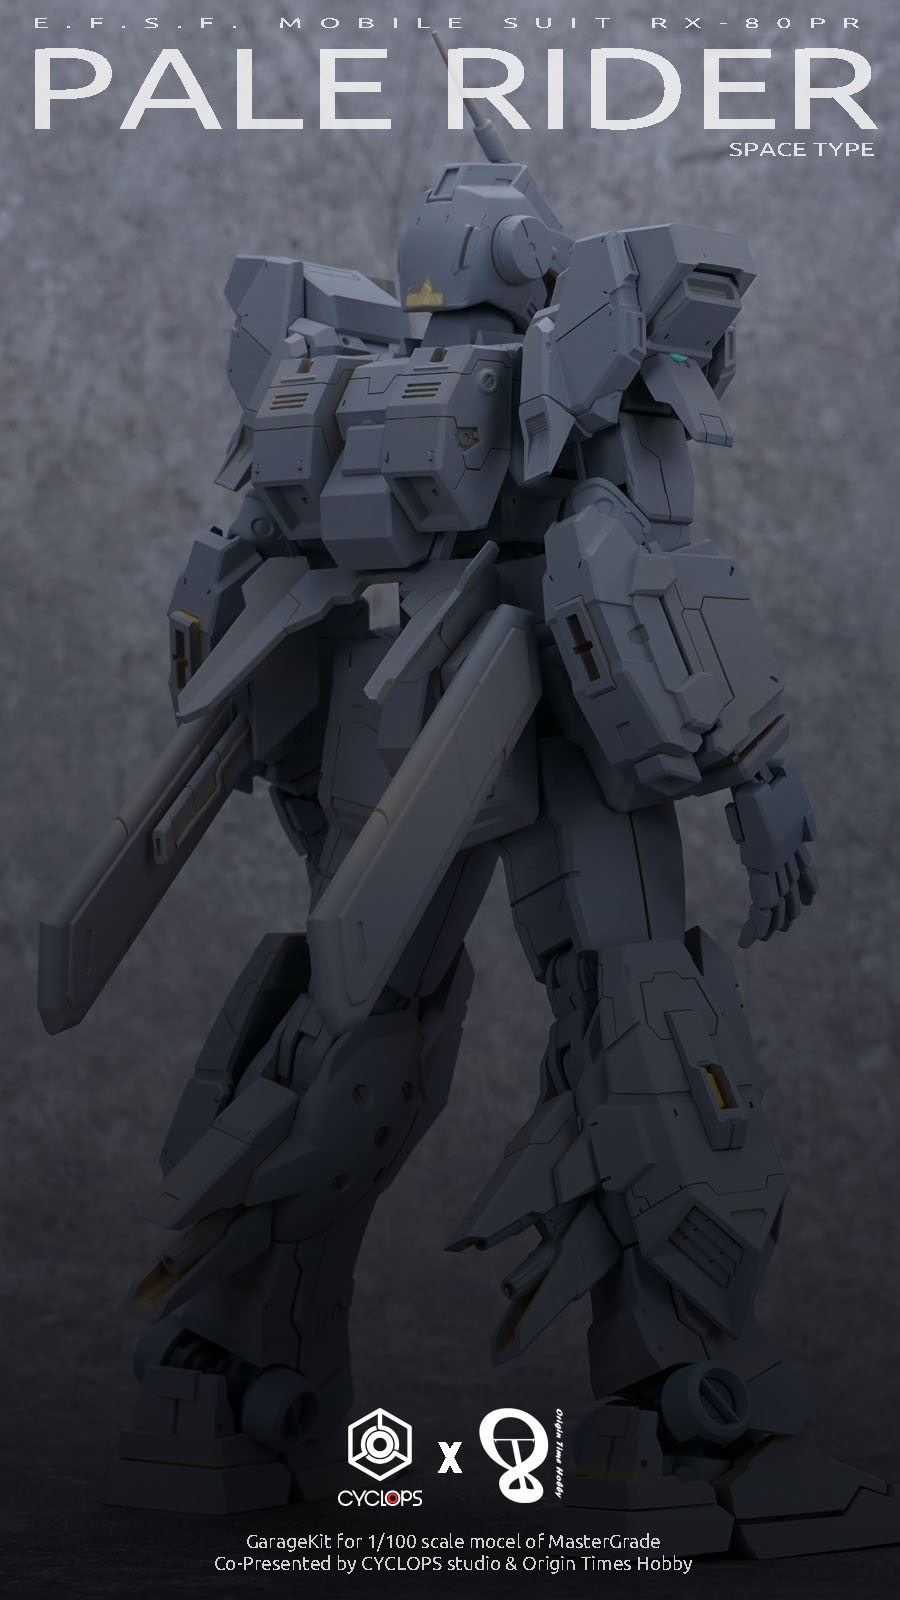 G600_MG_pale_rider_rx80PR_space_type_002.jpg